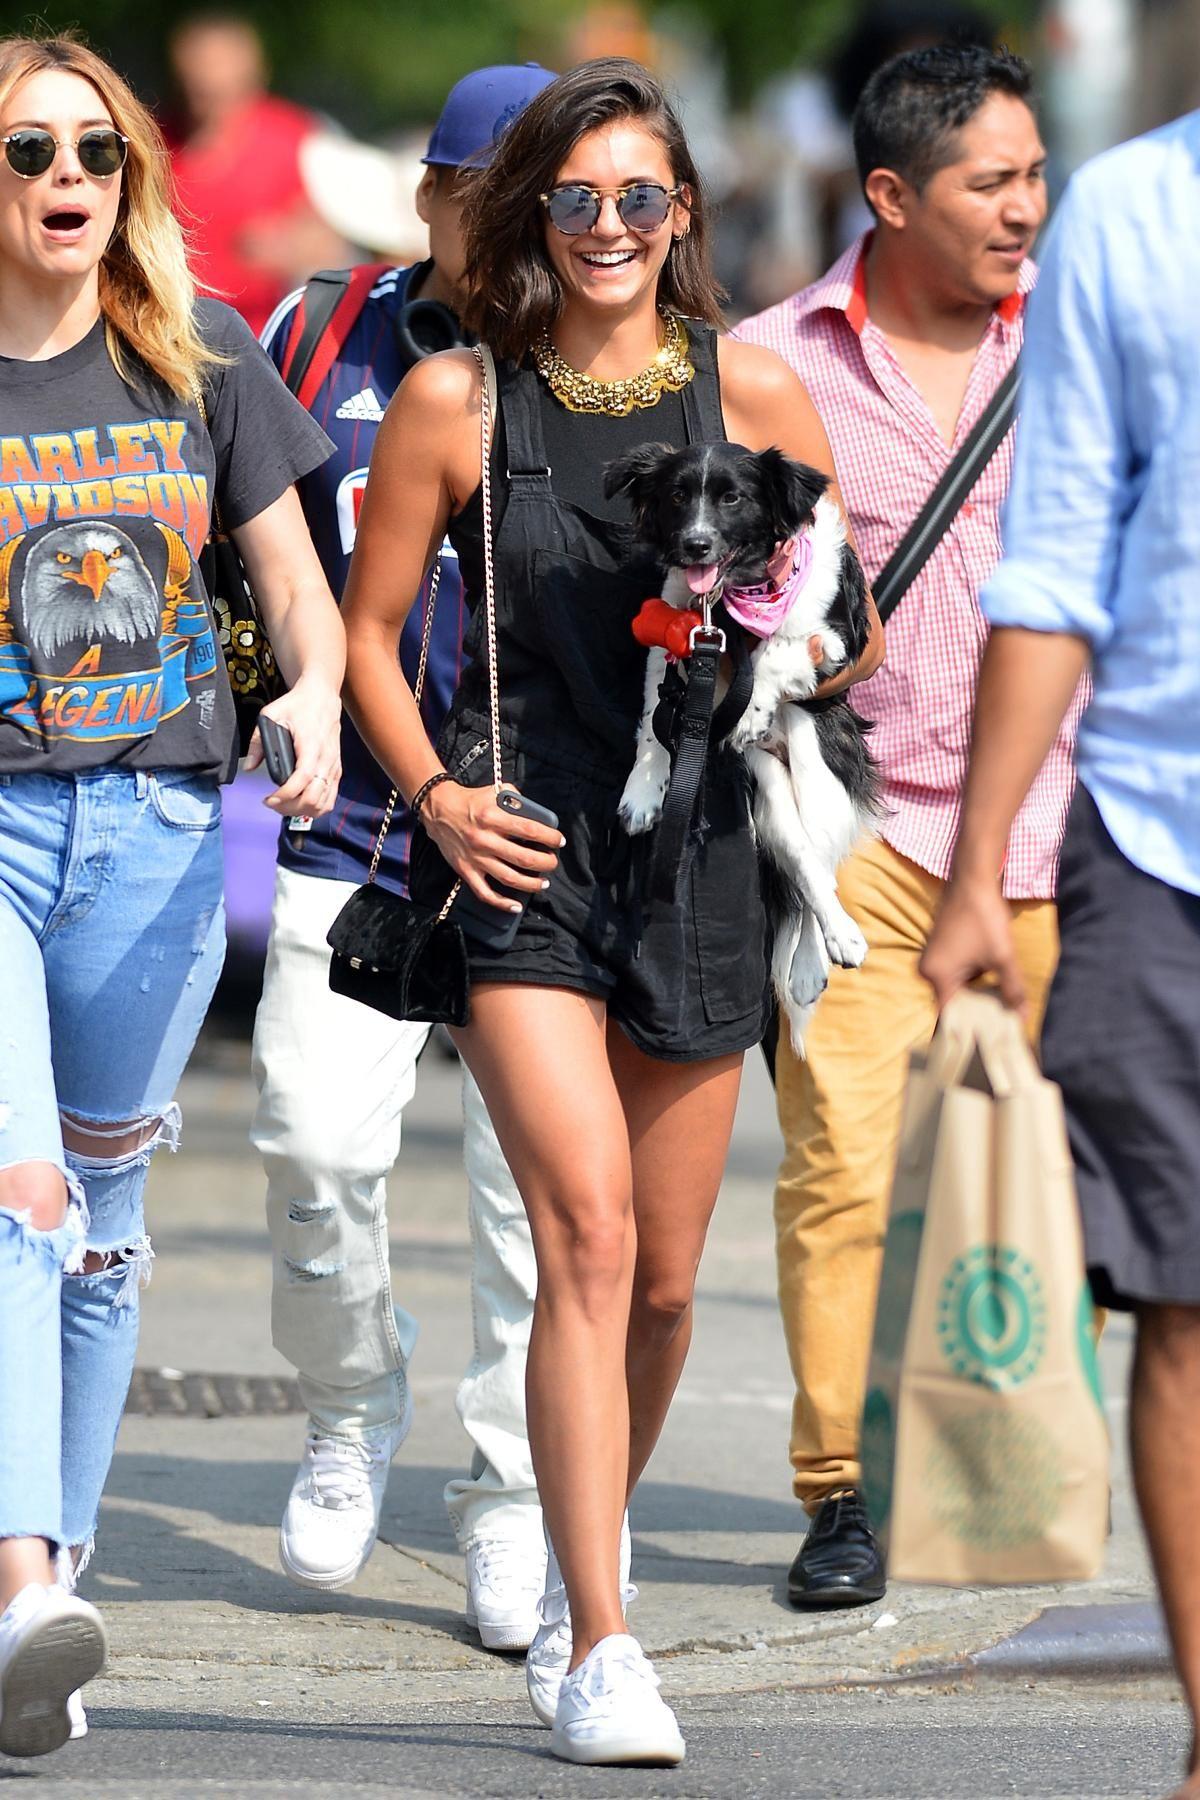 d4b0e3944c29 Nina Dobrev wearing Reebok Lifestyle Club C 85 Diamond Sneakers and Krewe  St. Louis Sunglasses in Matte Sunday Tortoise